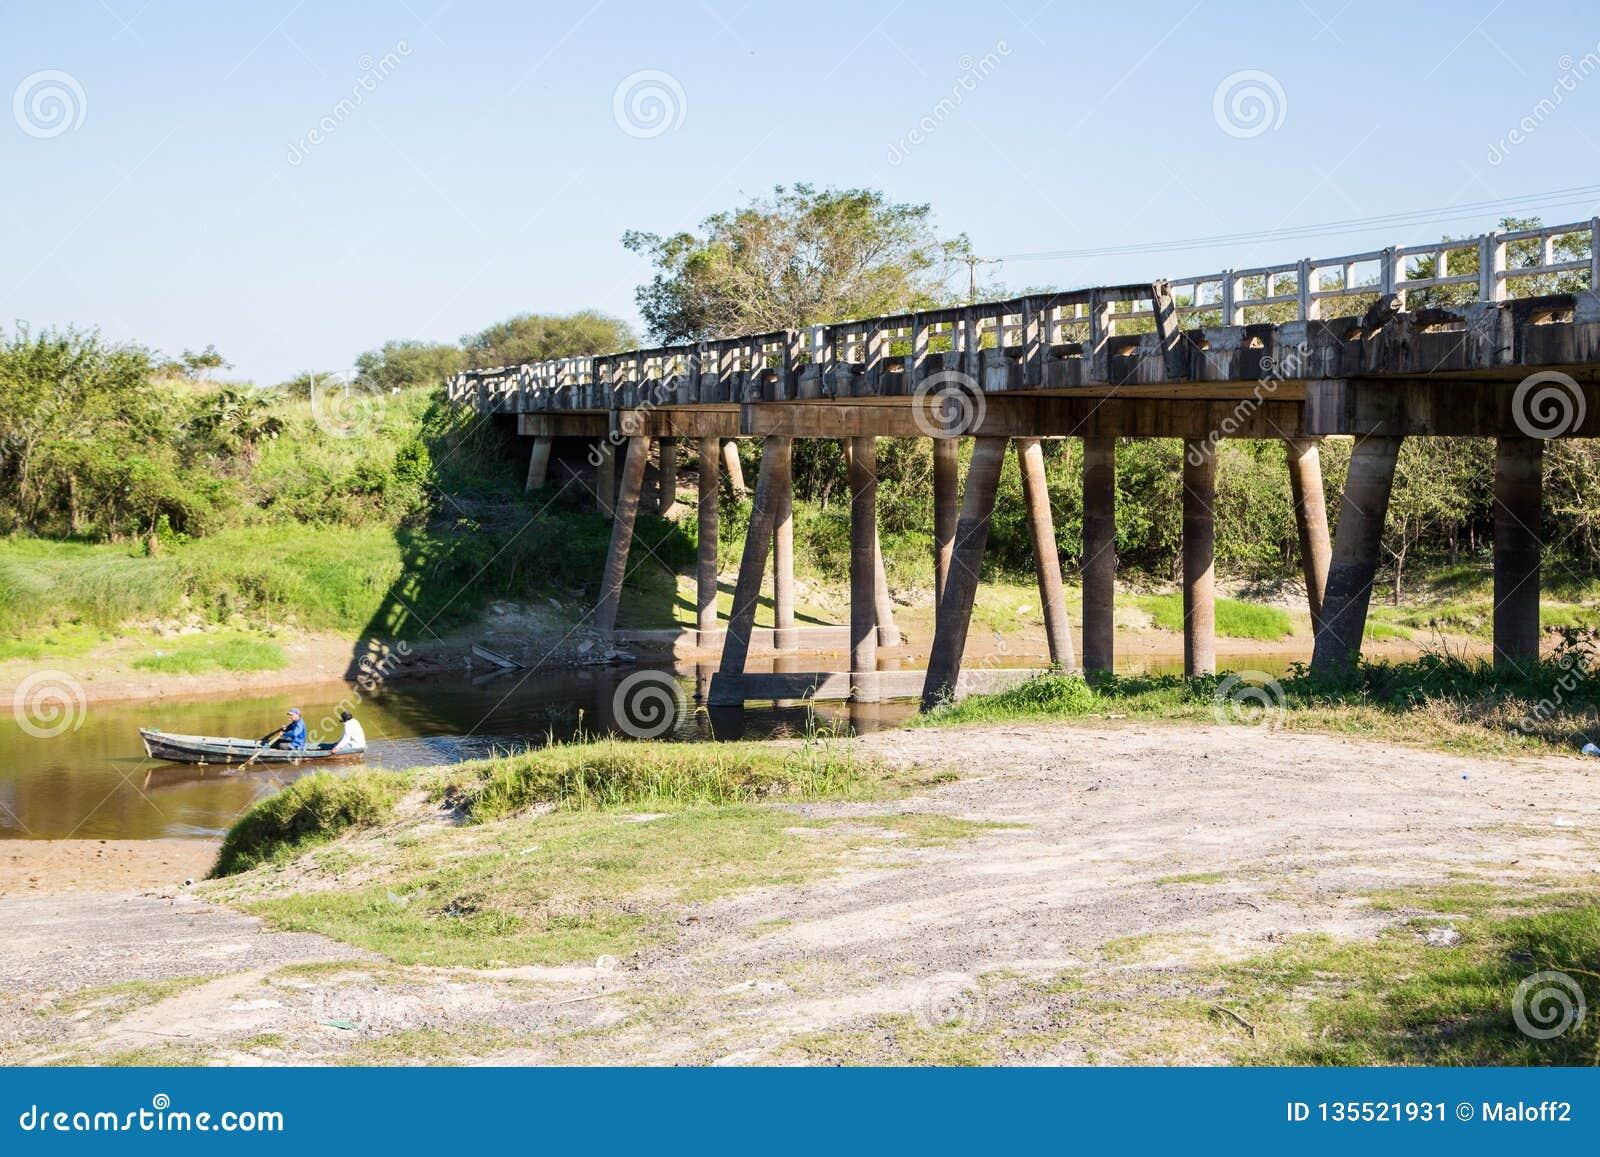 National Route 9 highway runs over a river bridge in Paraguayan Gran Chaco savannah, Paraguay. Ruta Nacional Transchaco.